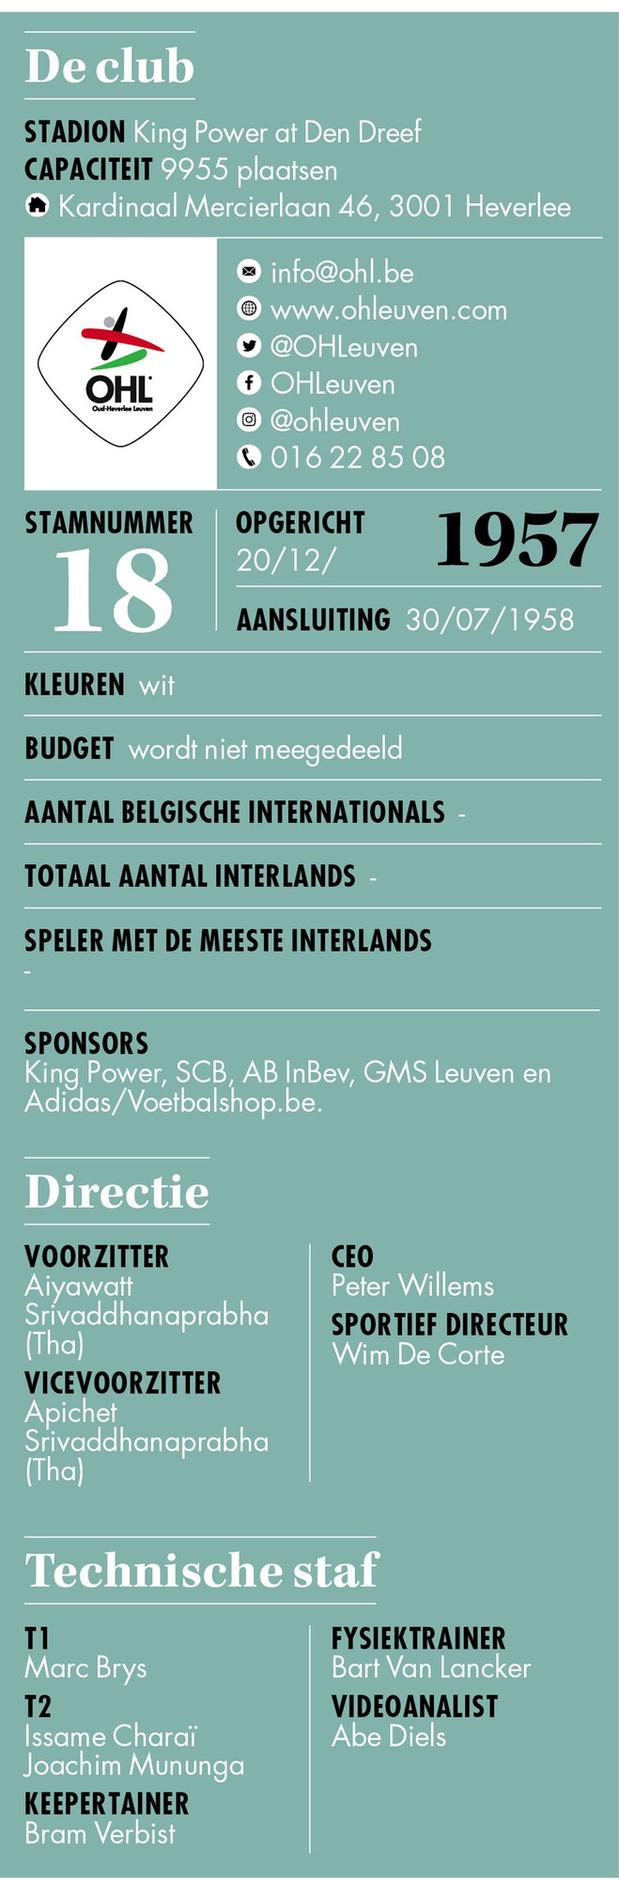 OH Leuven - Info